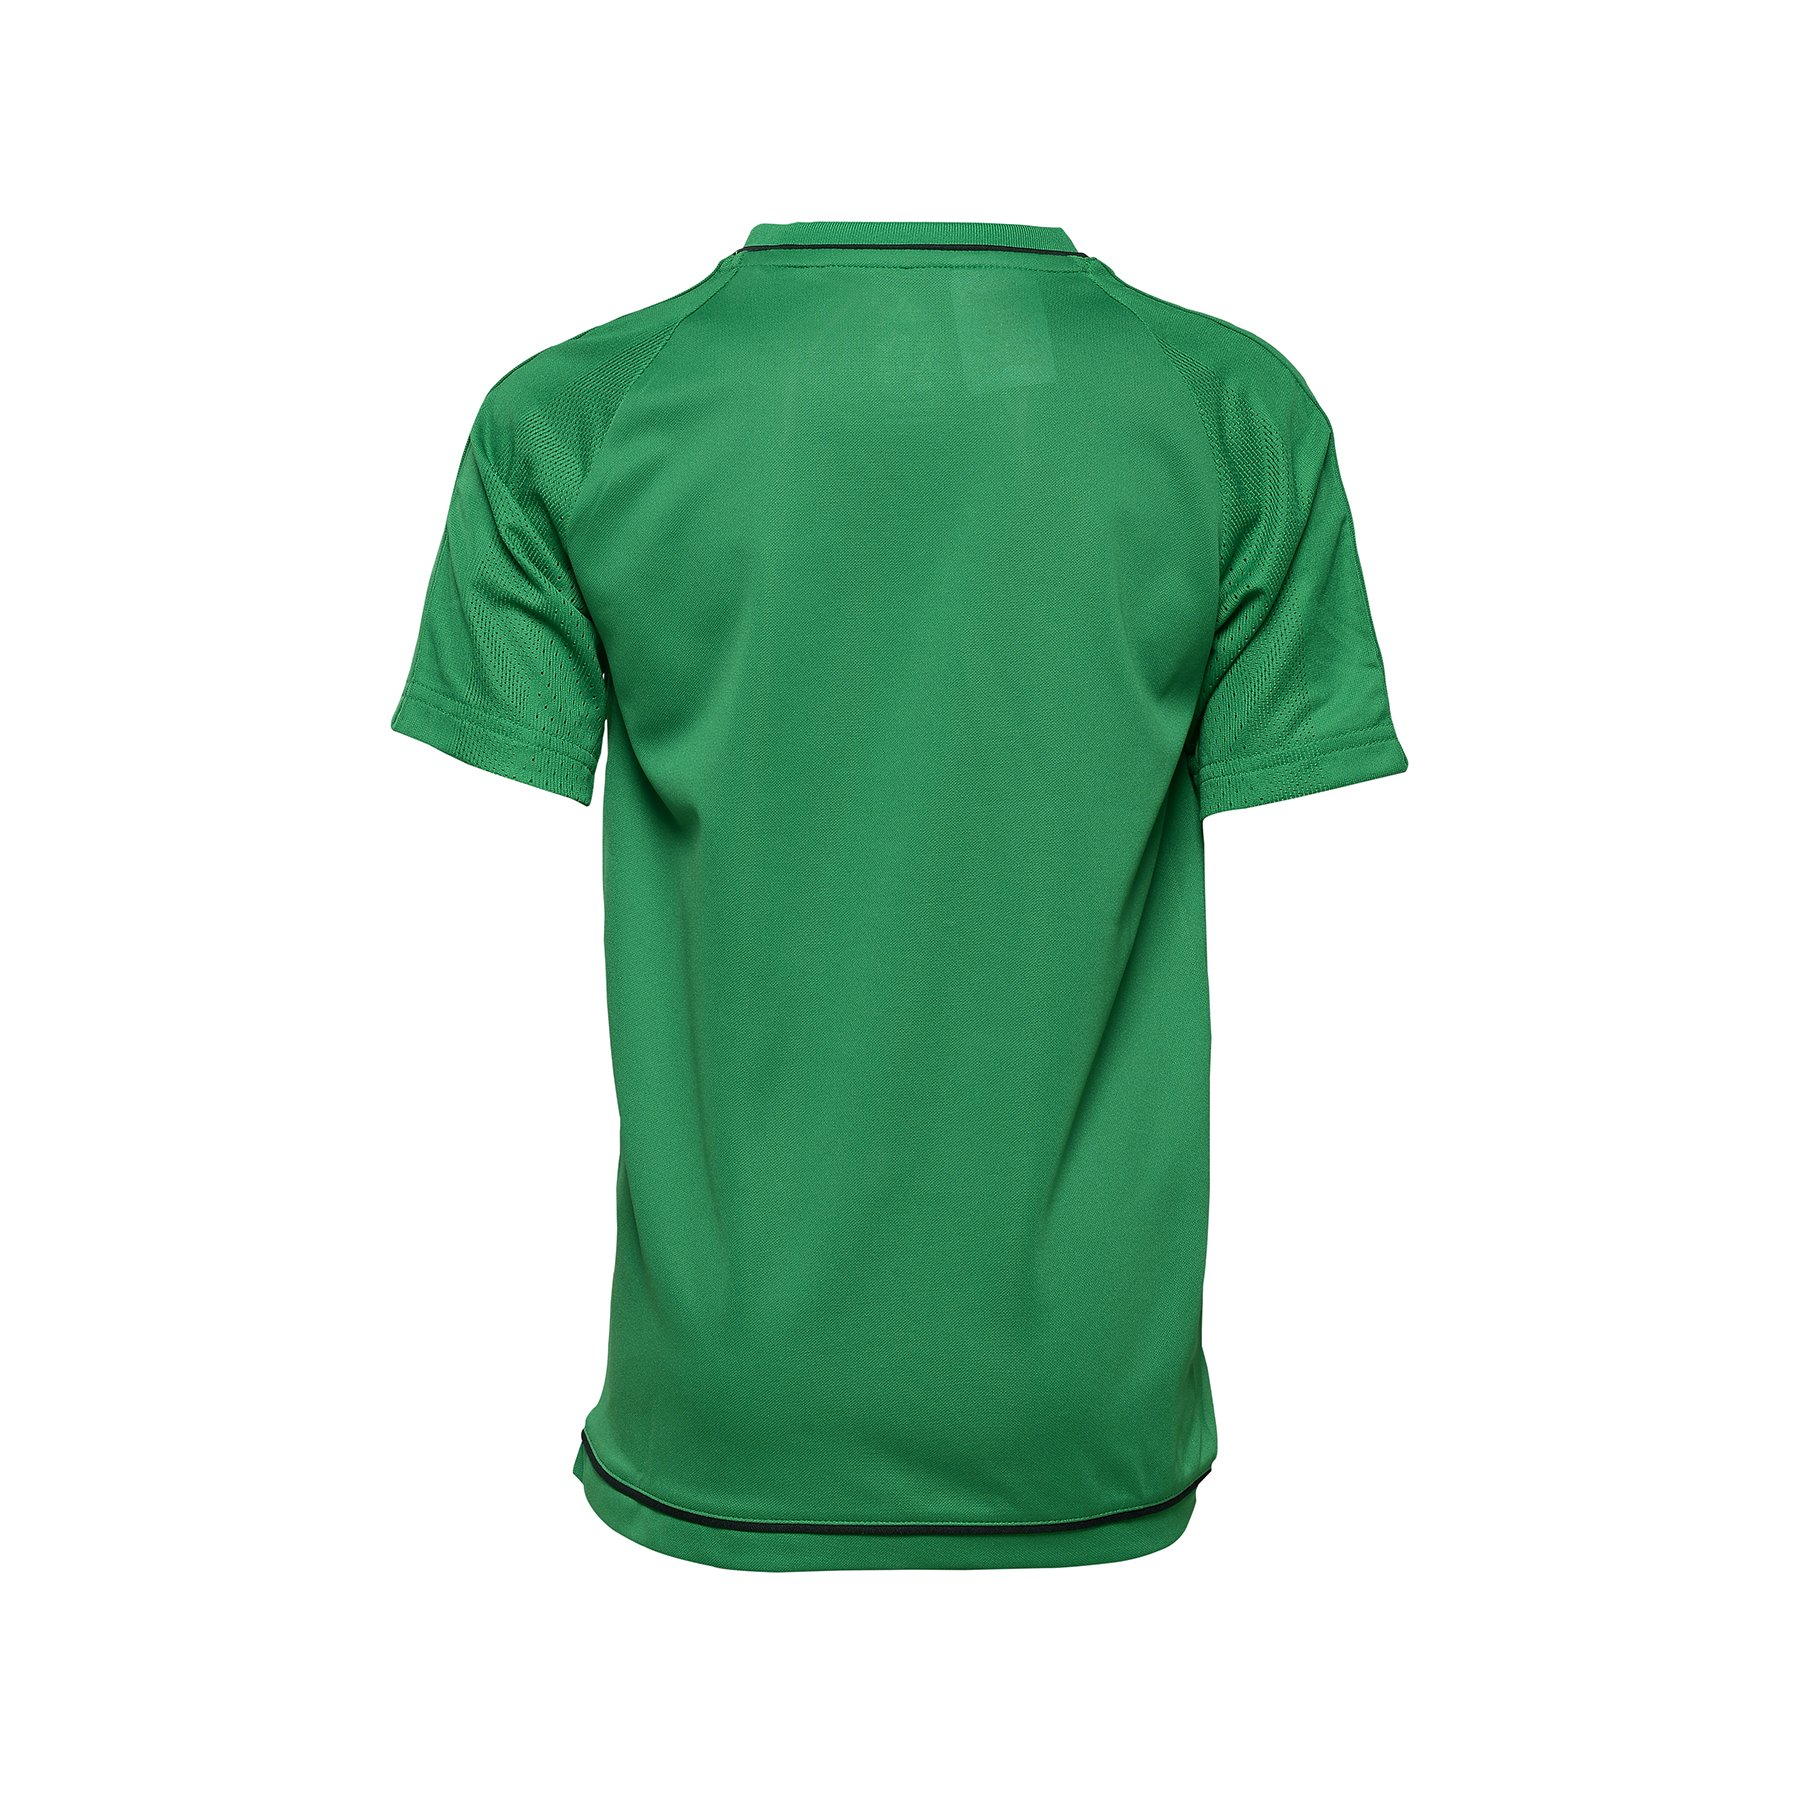 be538a4589d87e adidas :: adidas Performance :: Odzież :: Koszulki :: Koszulka ...